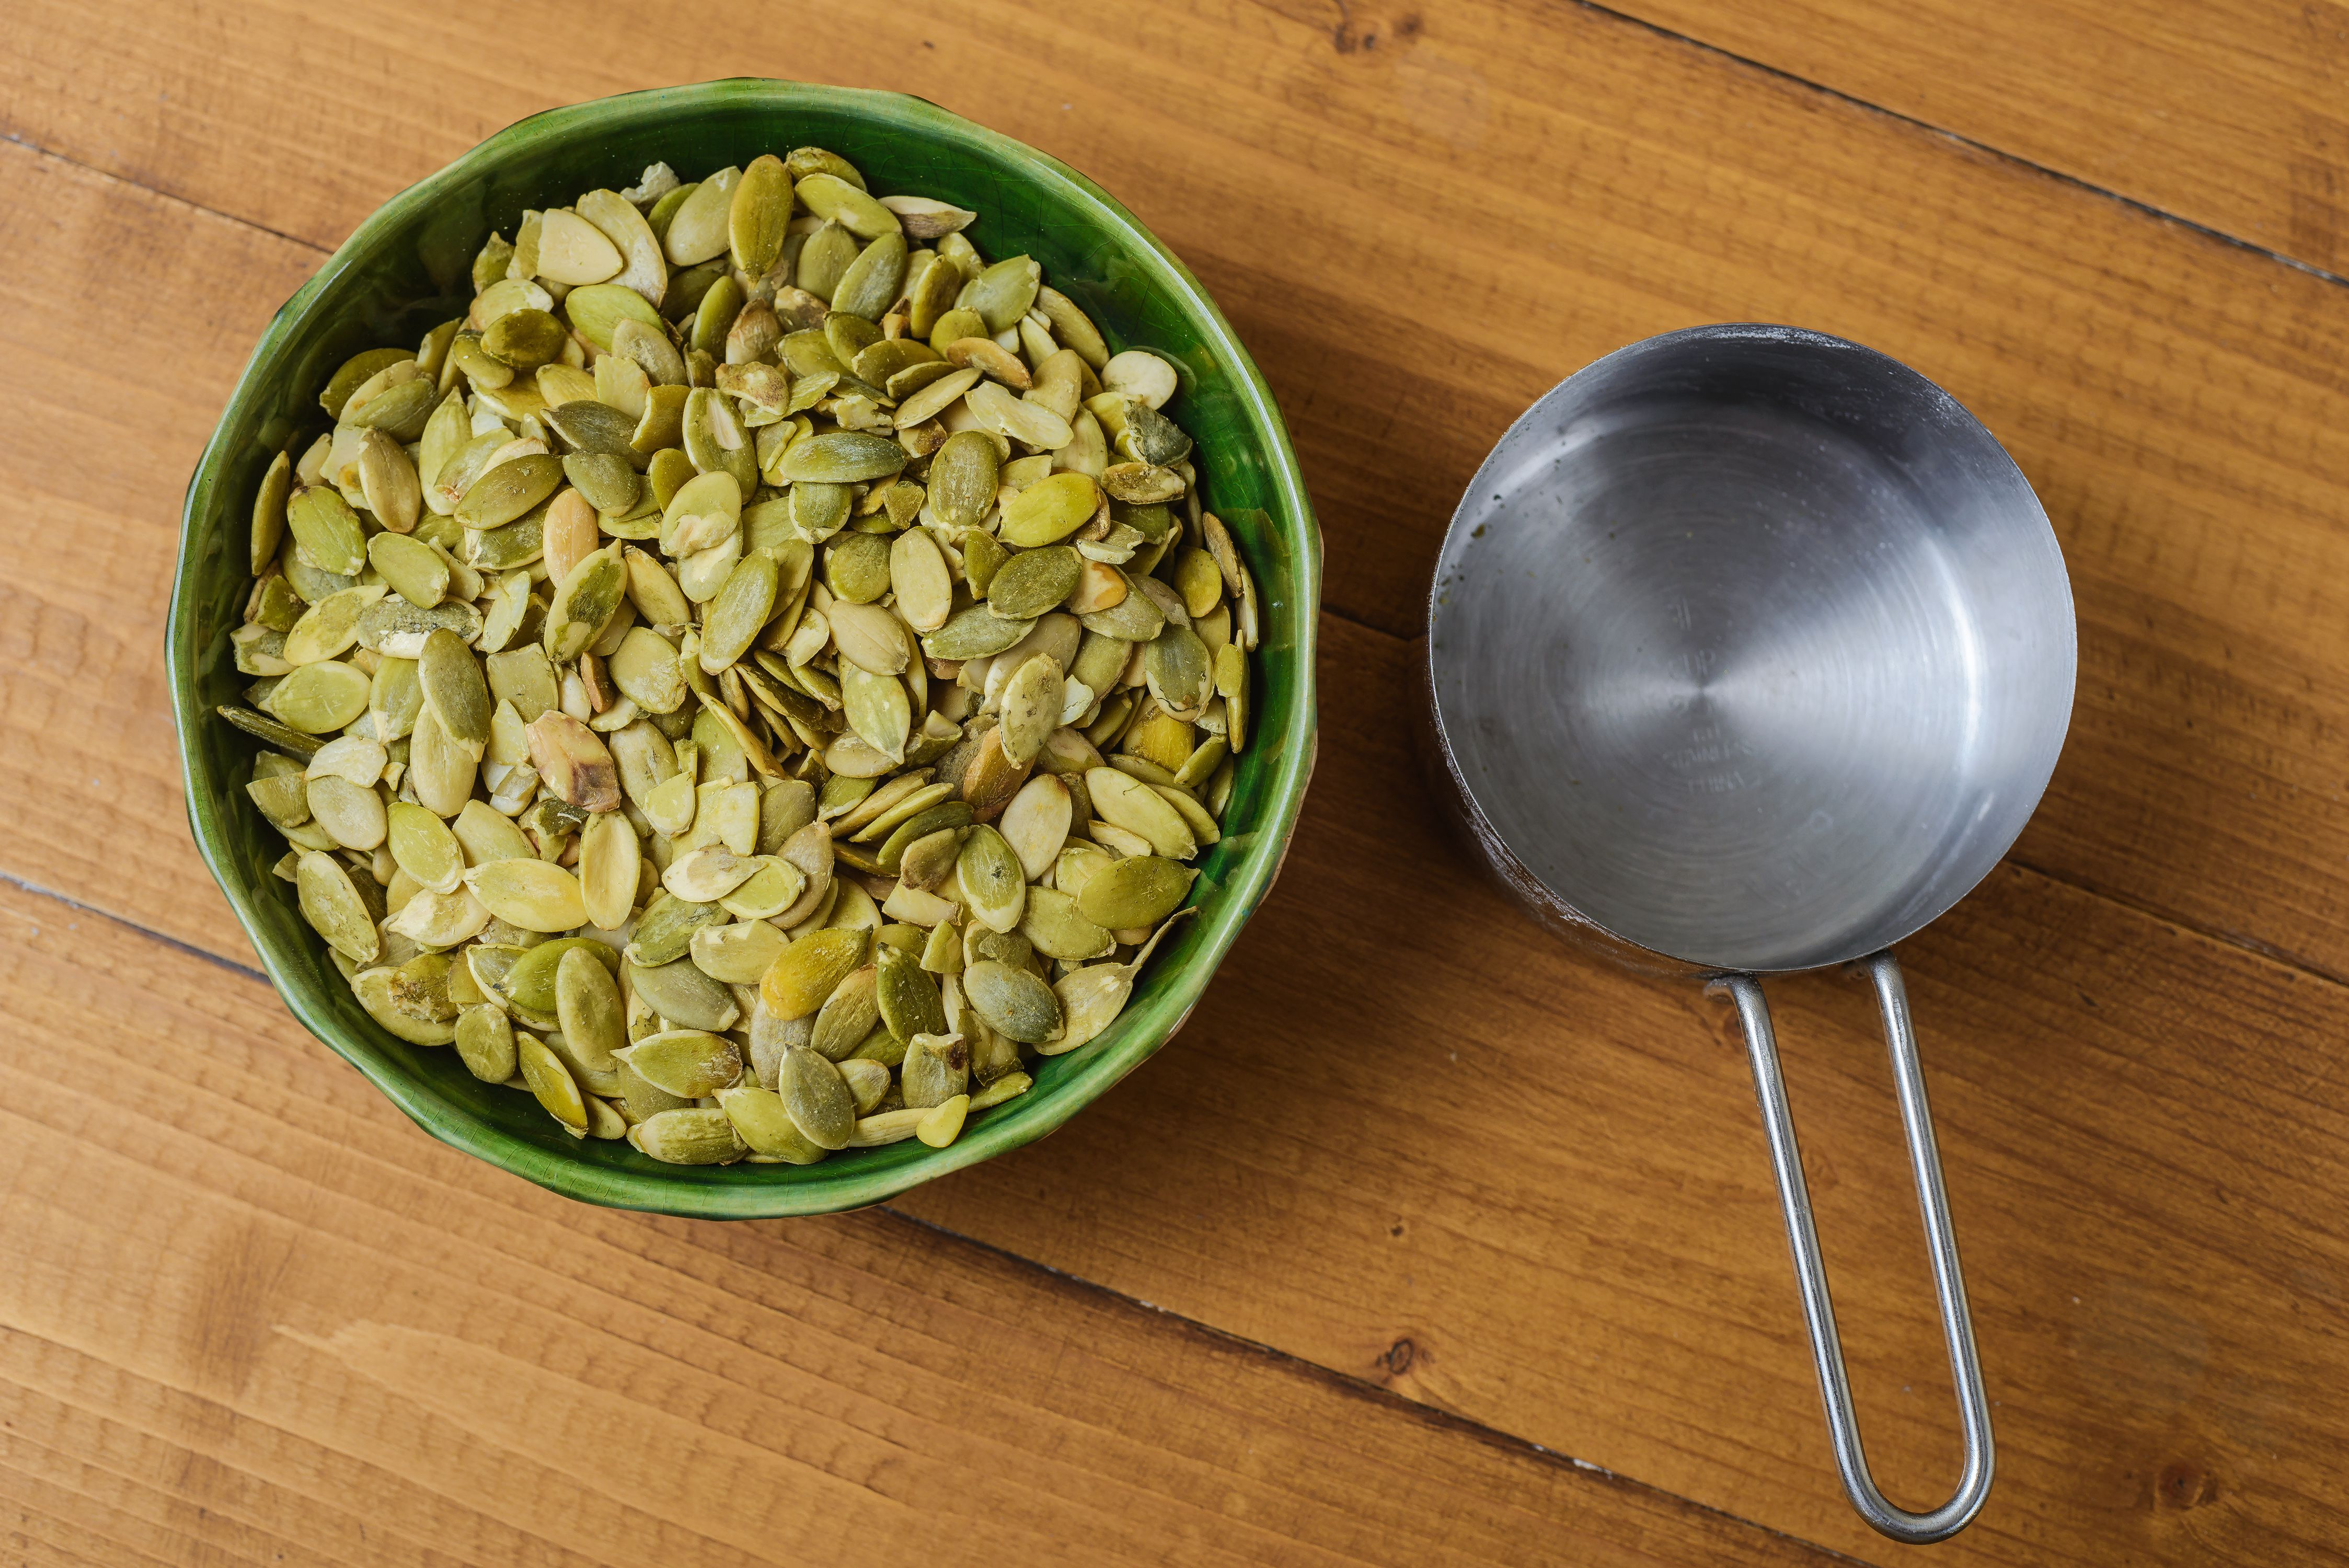 Measure out pumpkin seeds